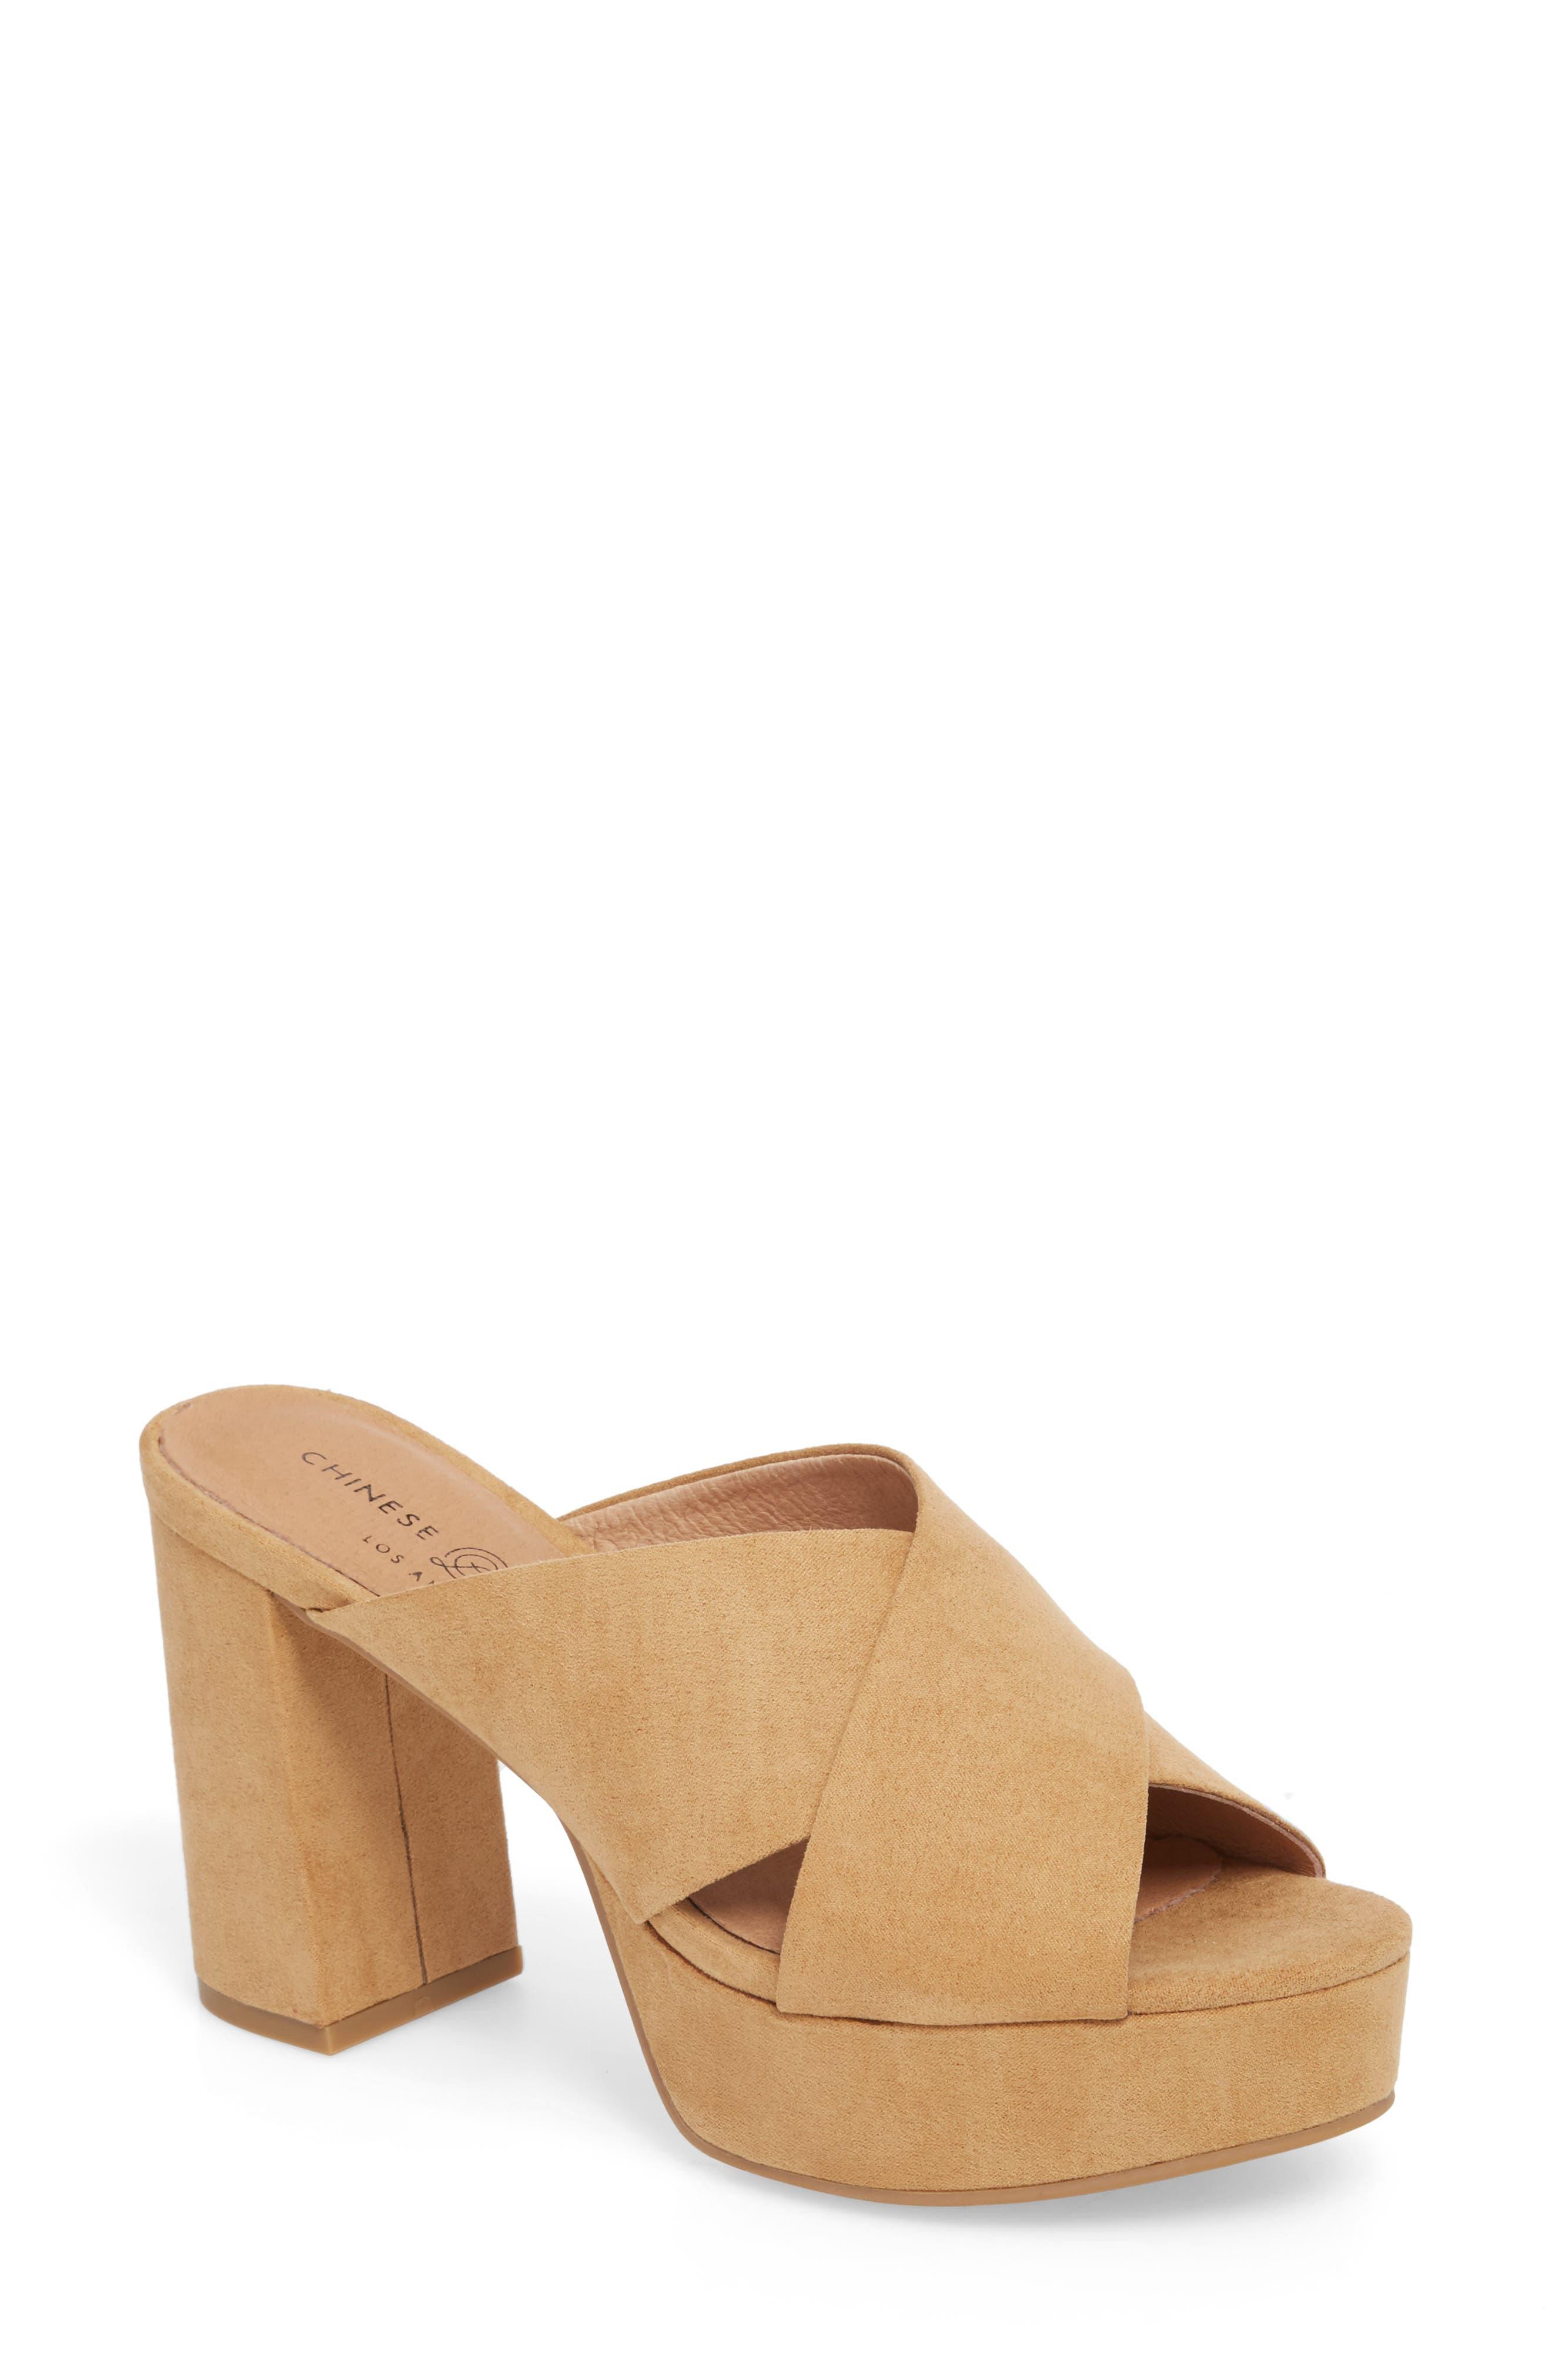 Teagan Cross Strap Platform Sandal,                         Main,                         color, Camel